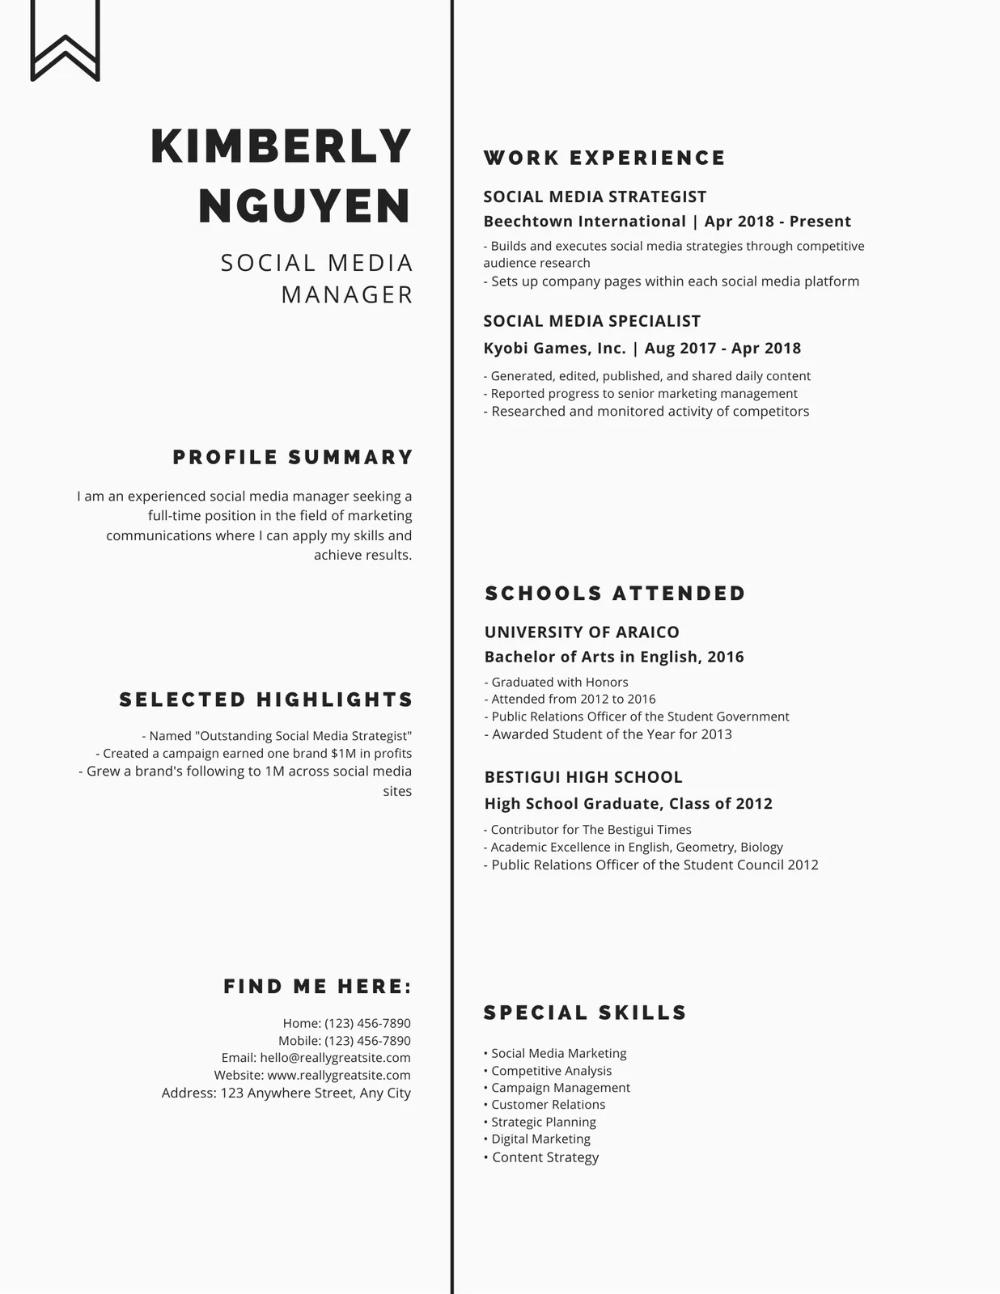 Professional Resume Design Canva